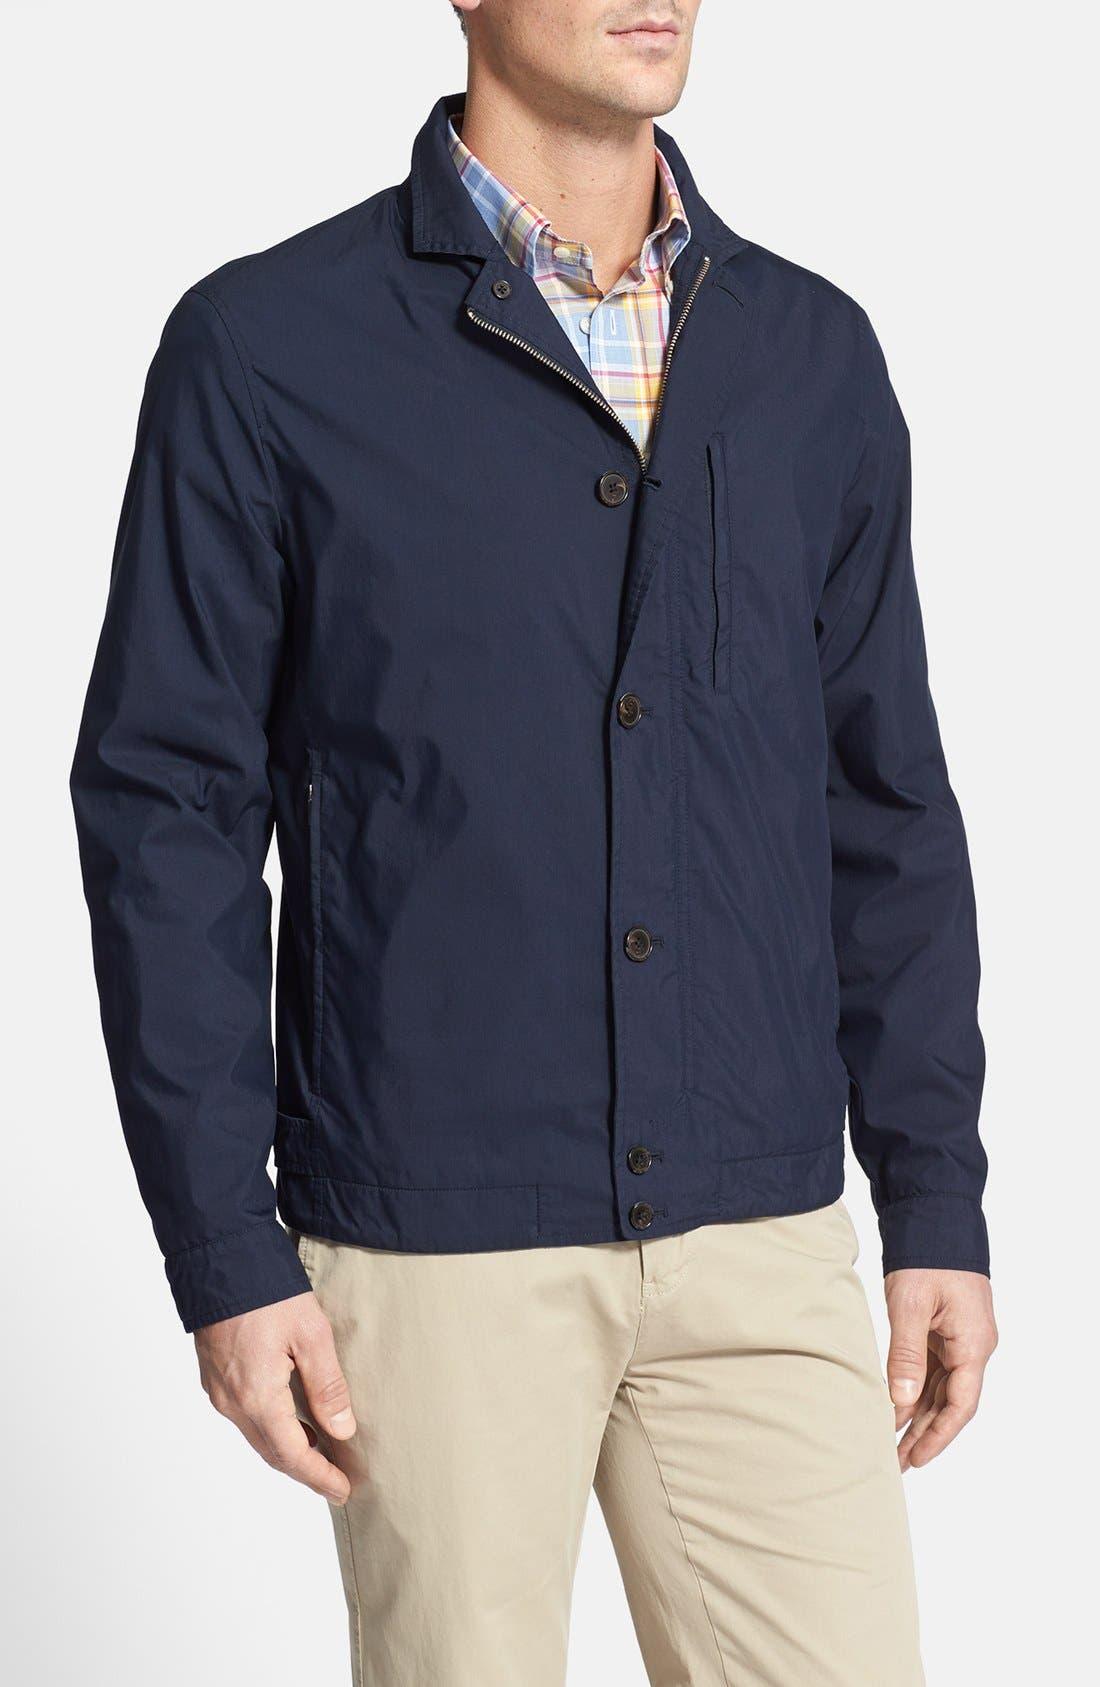 Alternate Image 1 Selected - Façonnable Cotton Blend Jacket